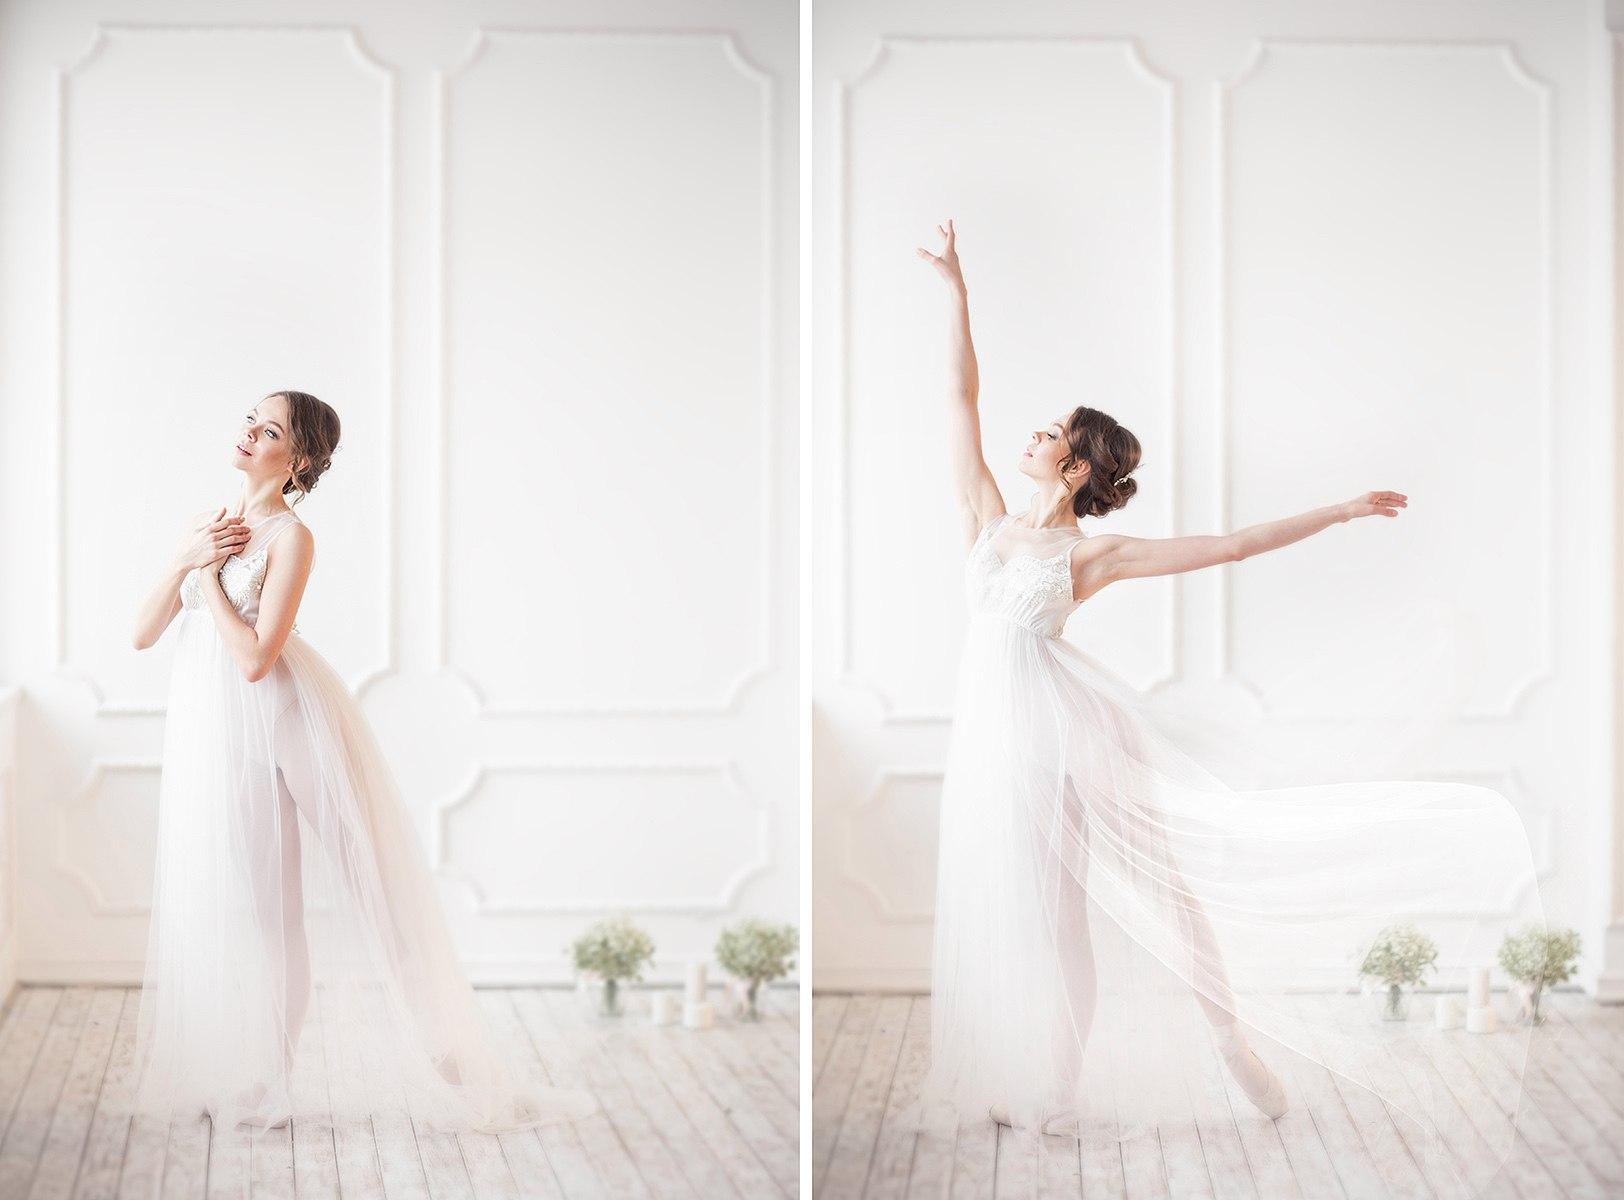 Фотосессия молодой красивой балерины